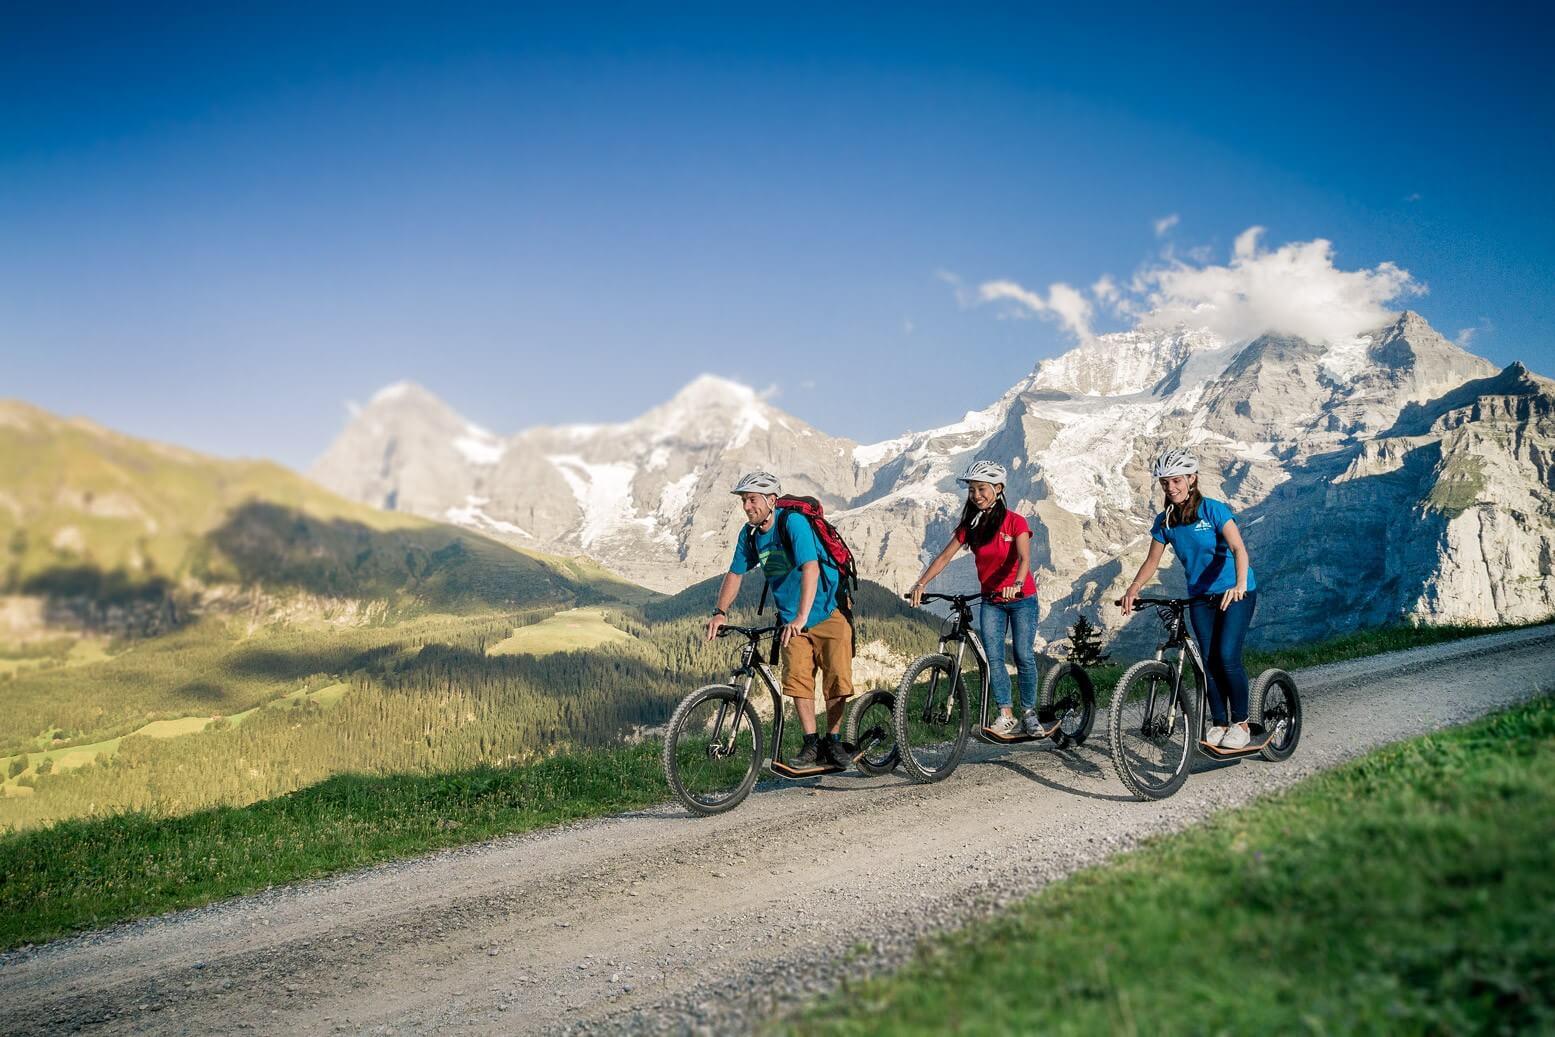 gruetschalp-gravity-scooter-monster-trotti-sommer-panorama-berge-abfahrt